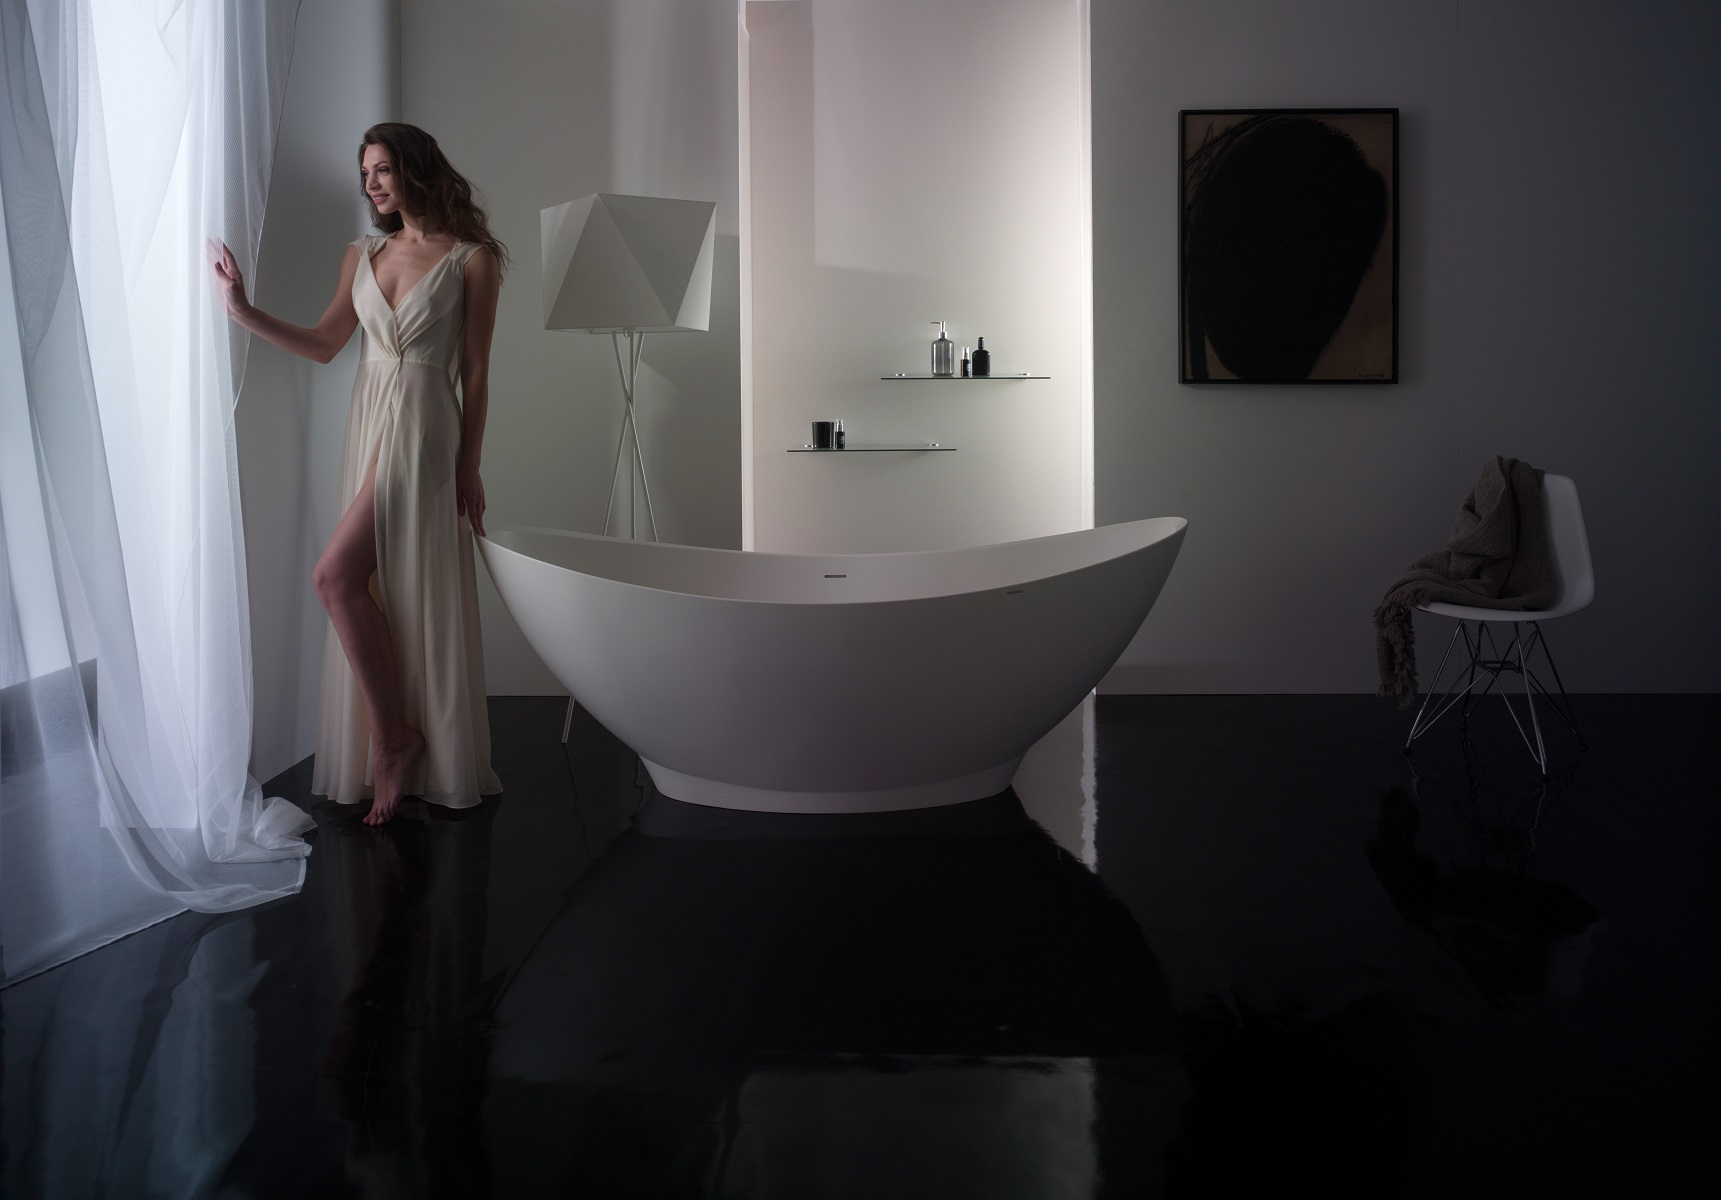 Purescape 621m vasca da bagno freestanding aquatica in - Vasca da bagno in pietra ...